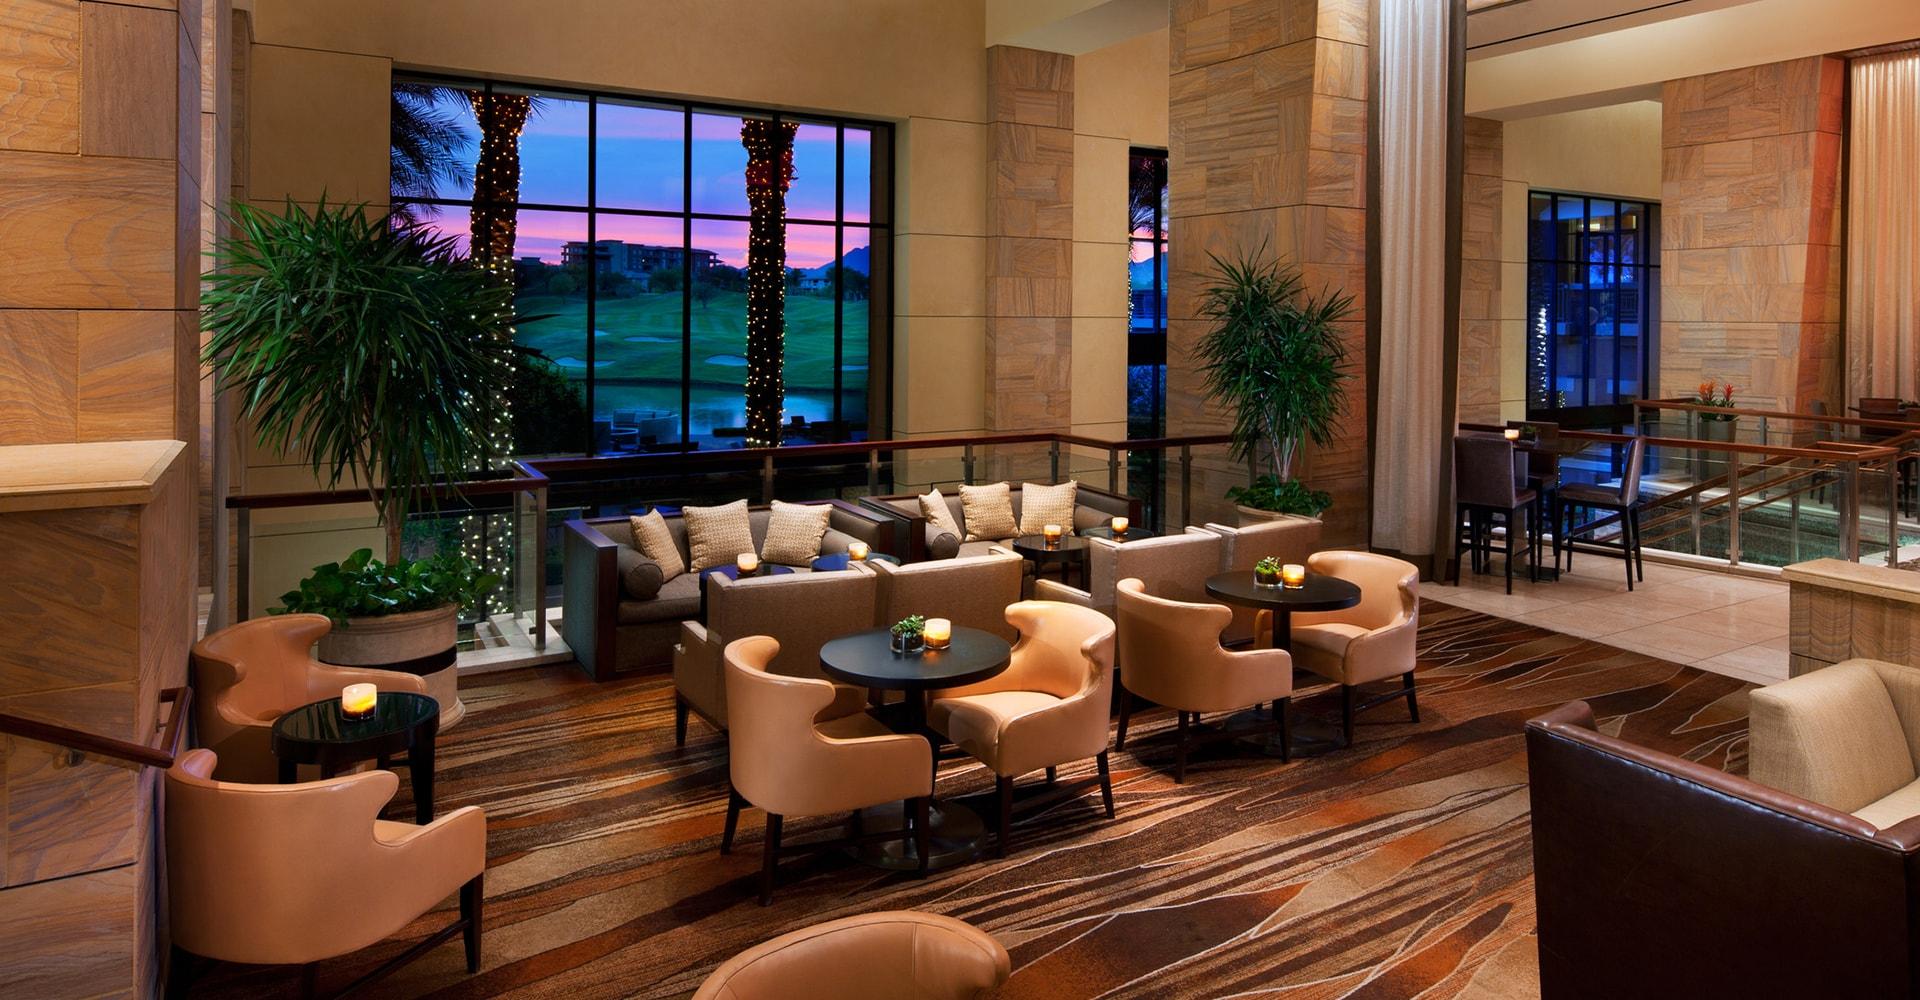 Kierland Westin Resort Lobby In Scottsdale Arizona